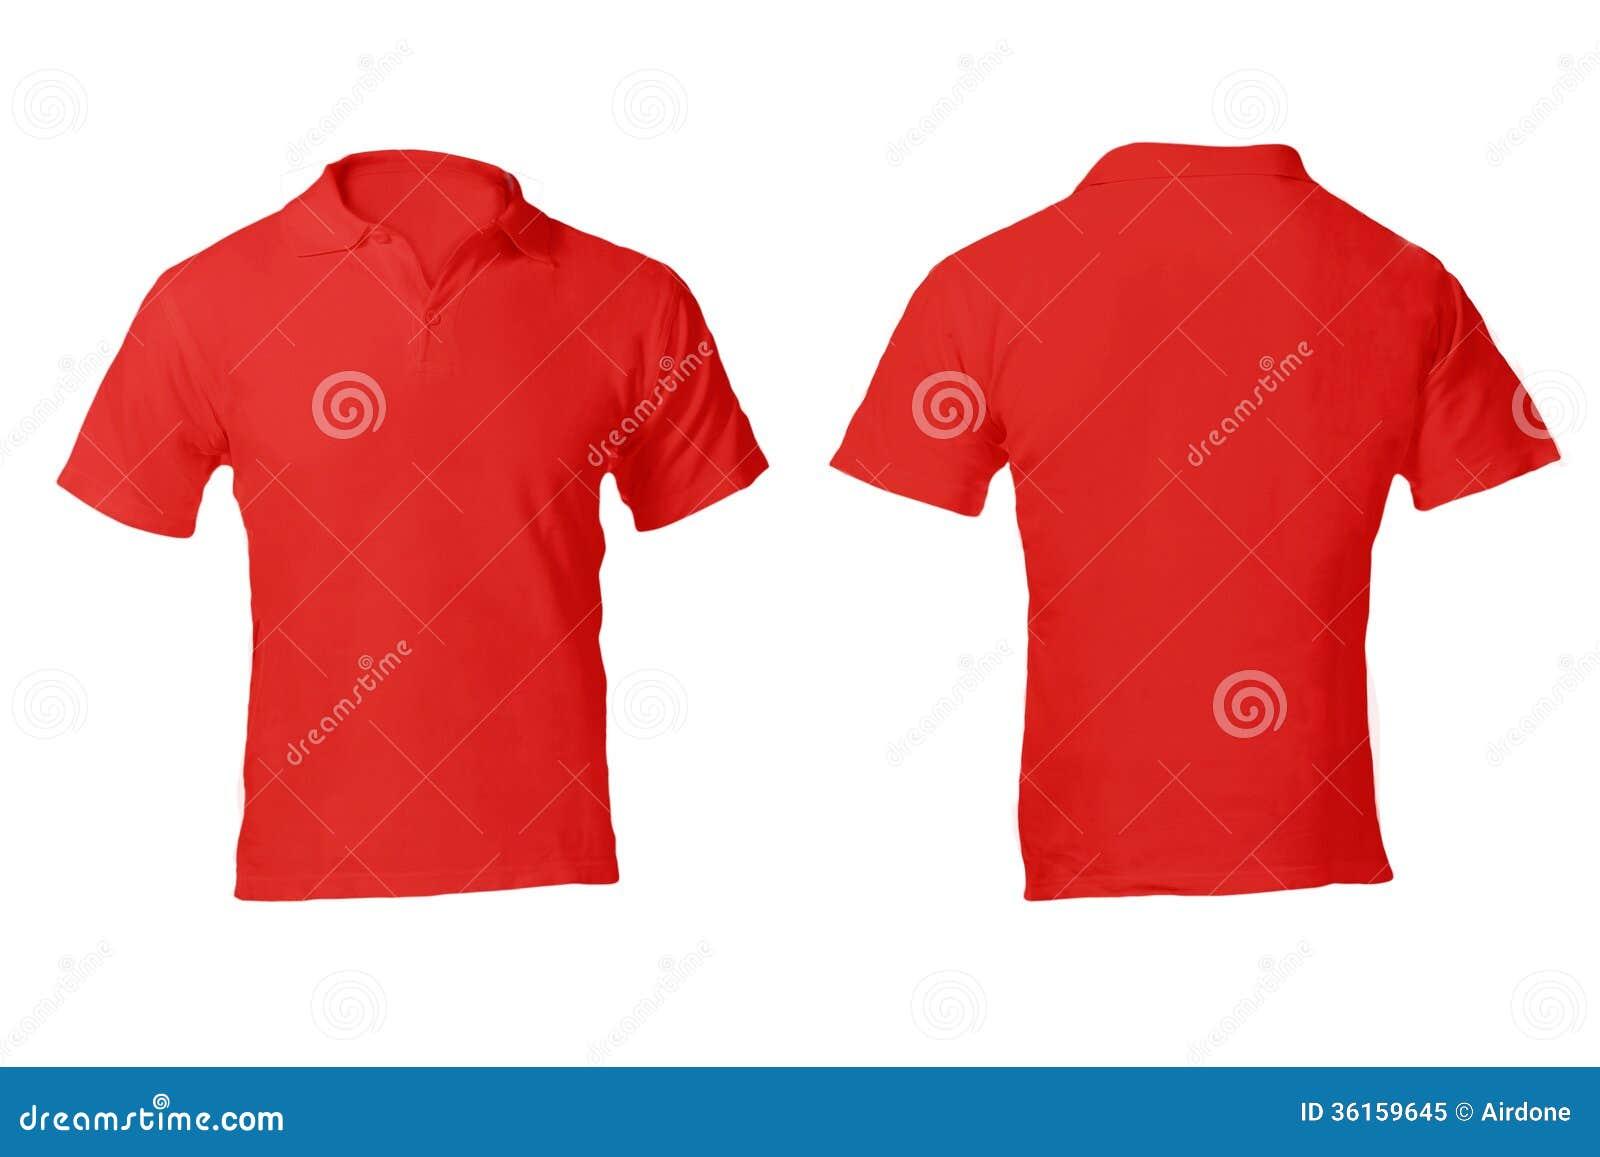 Leerer Roter Polo Shirt Template Der Männer Stockbild - Bild von ...